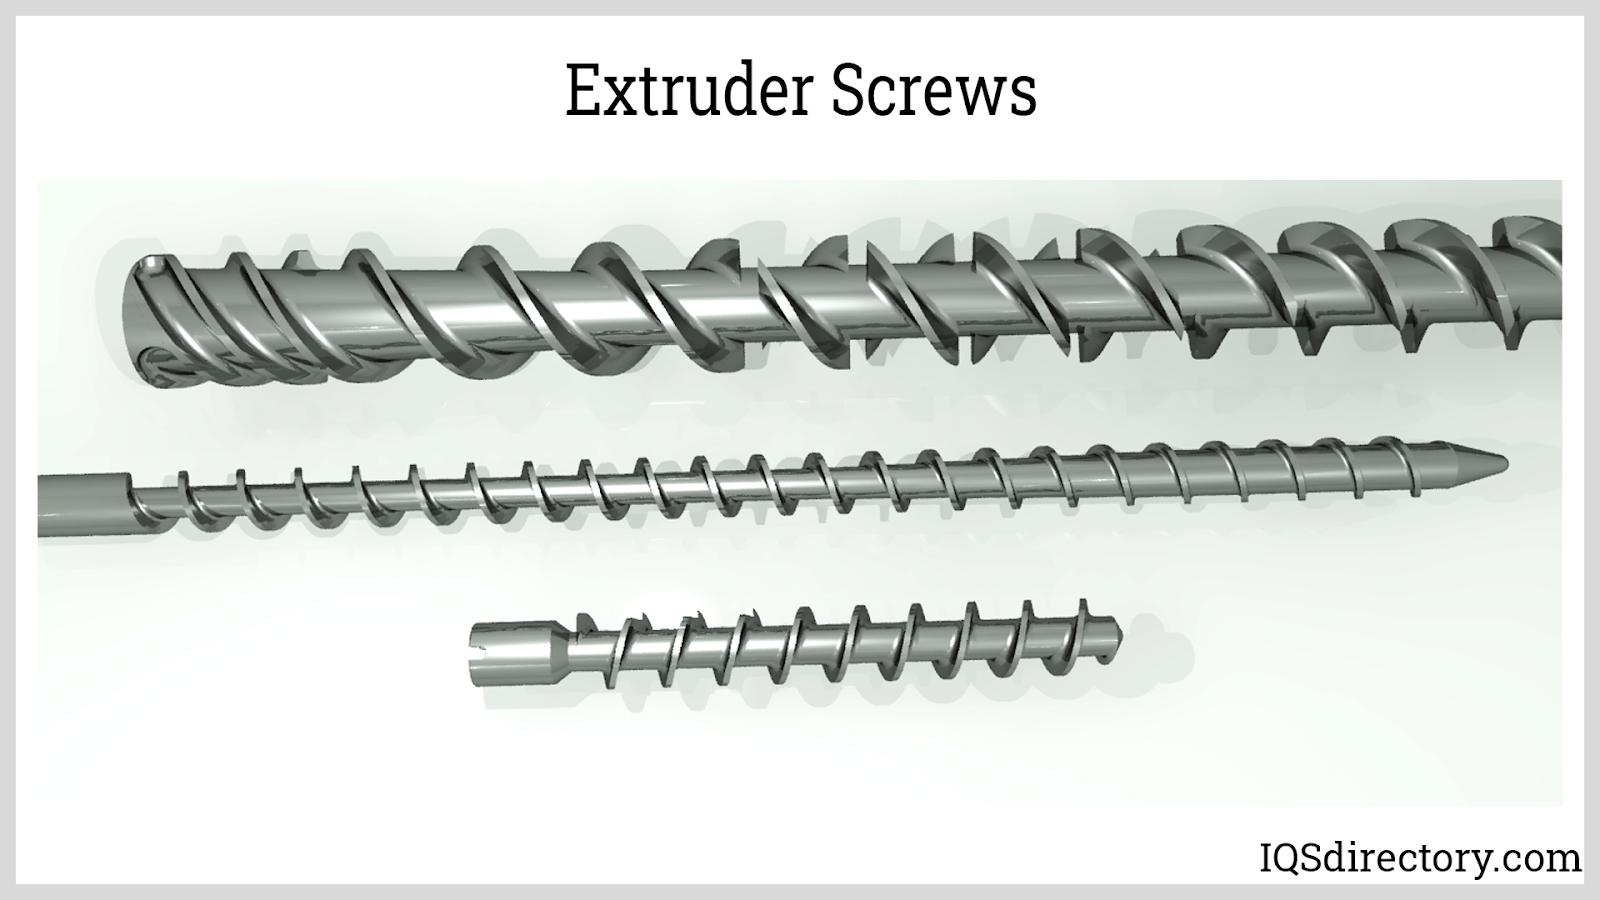 Extruder Screws